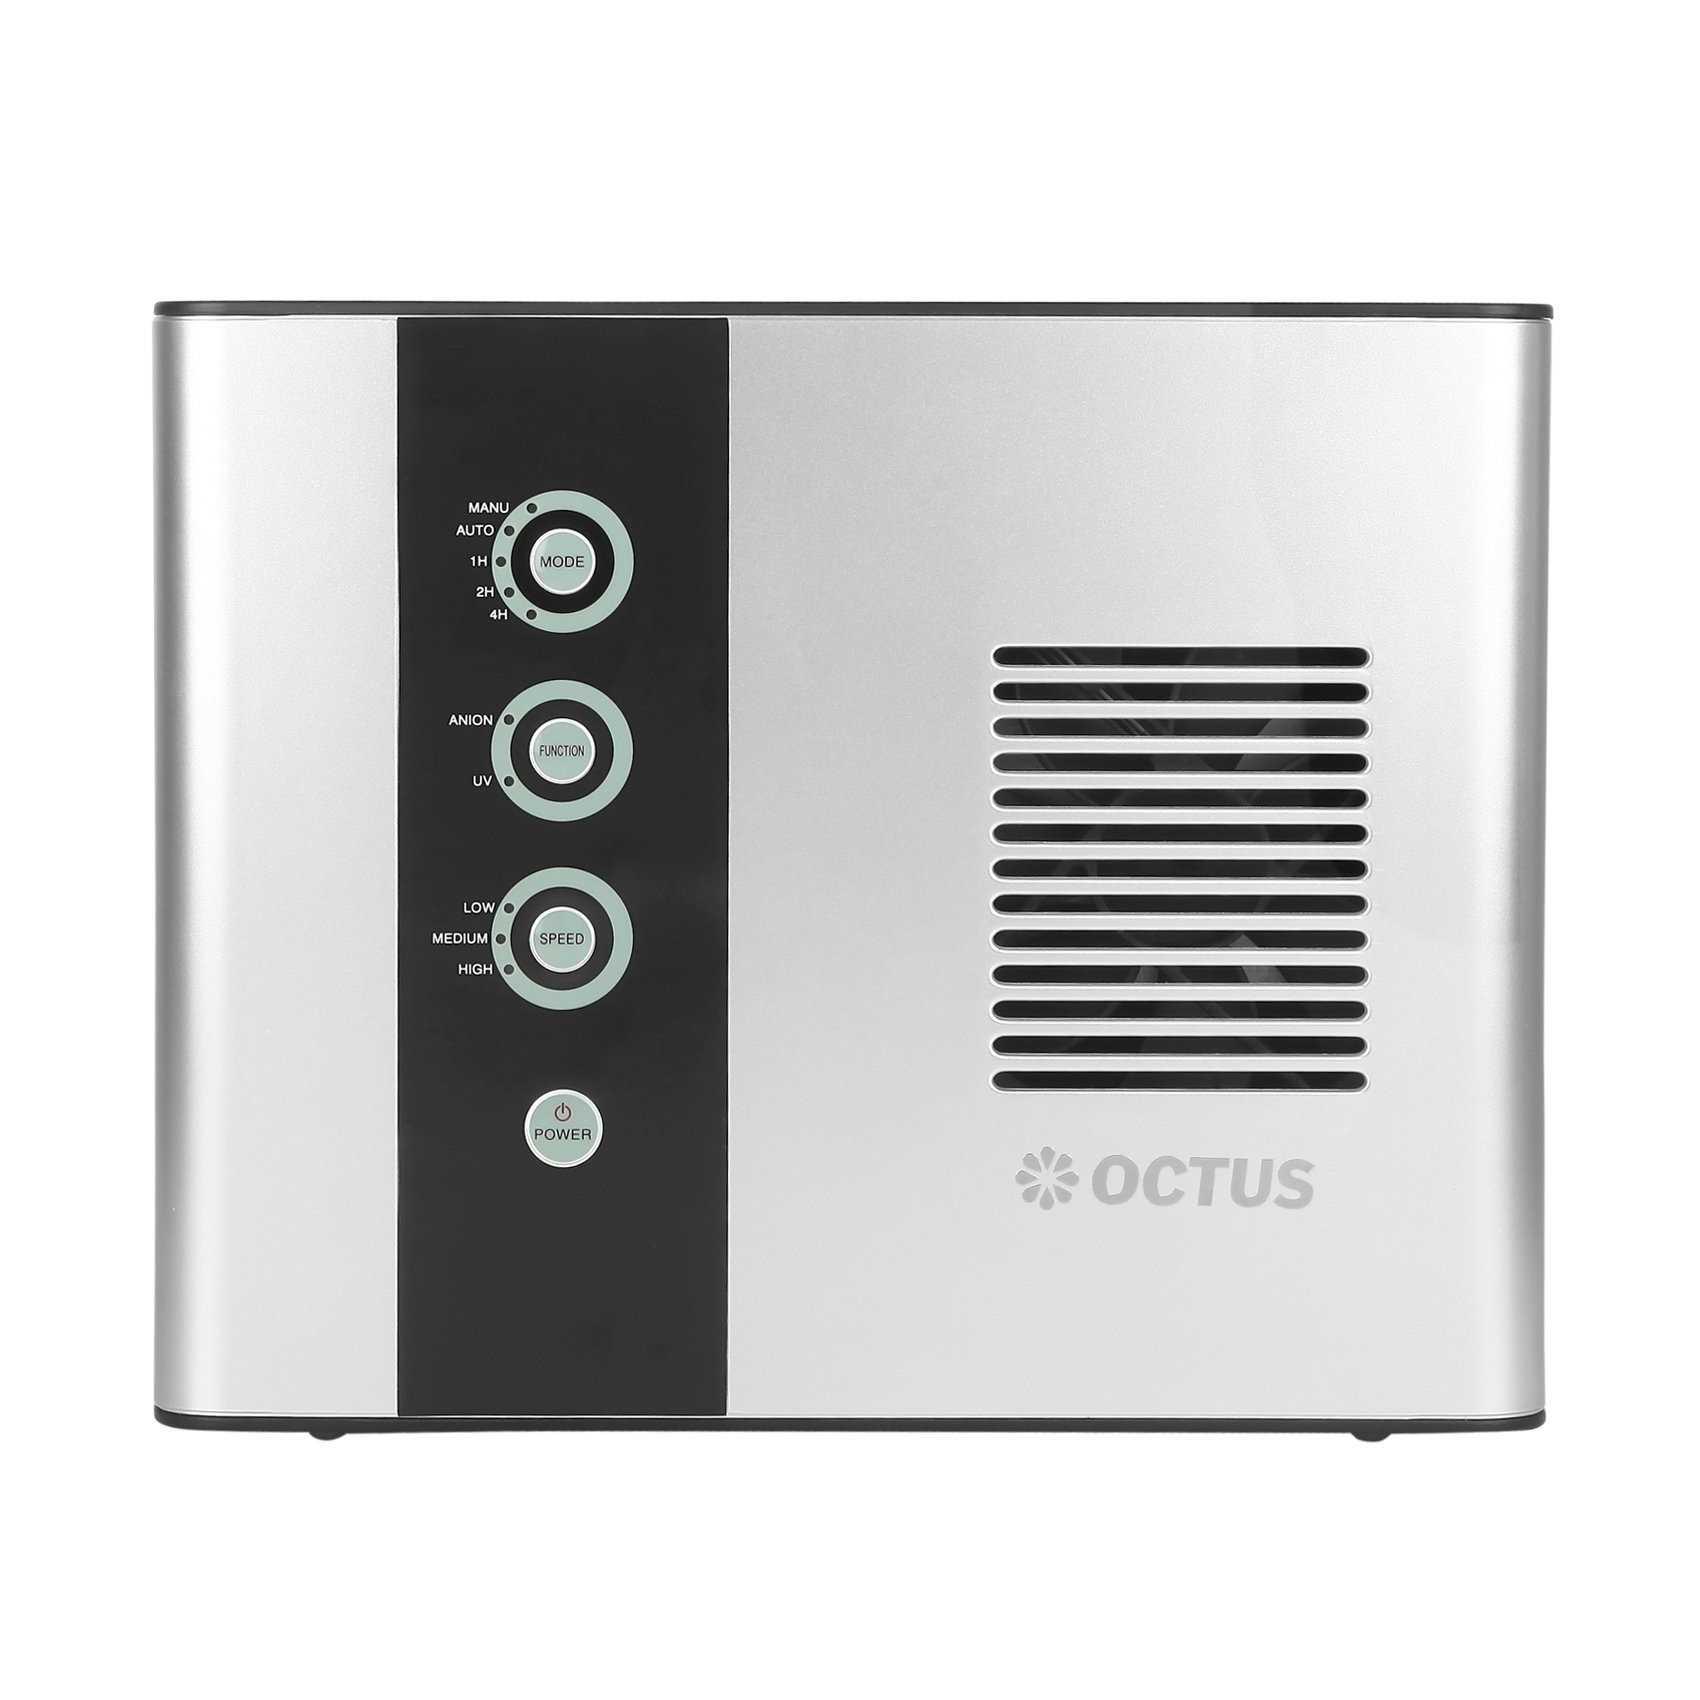 Octus Aerolife SOHO Room Air Purifier